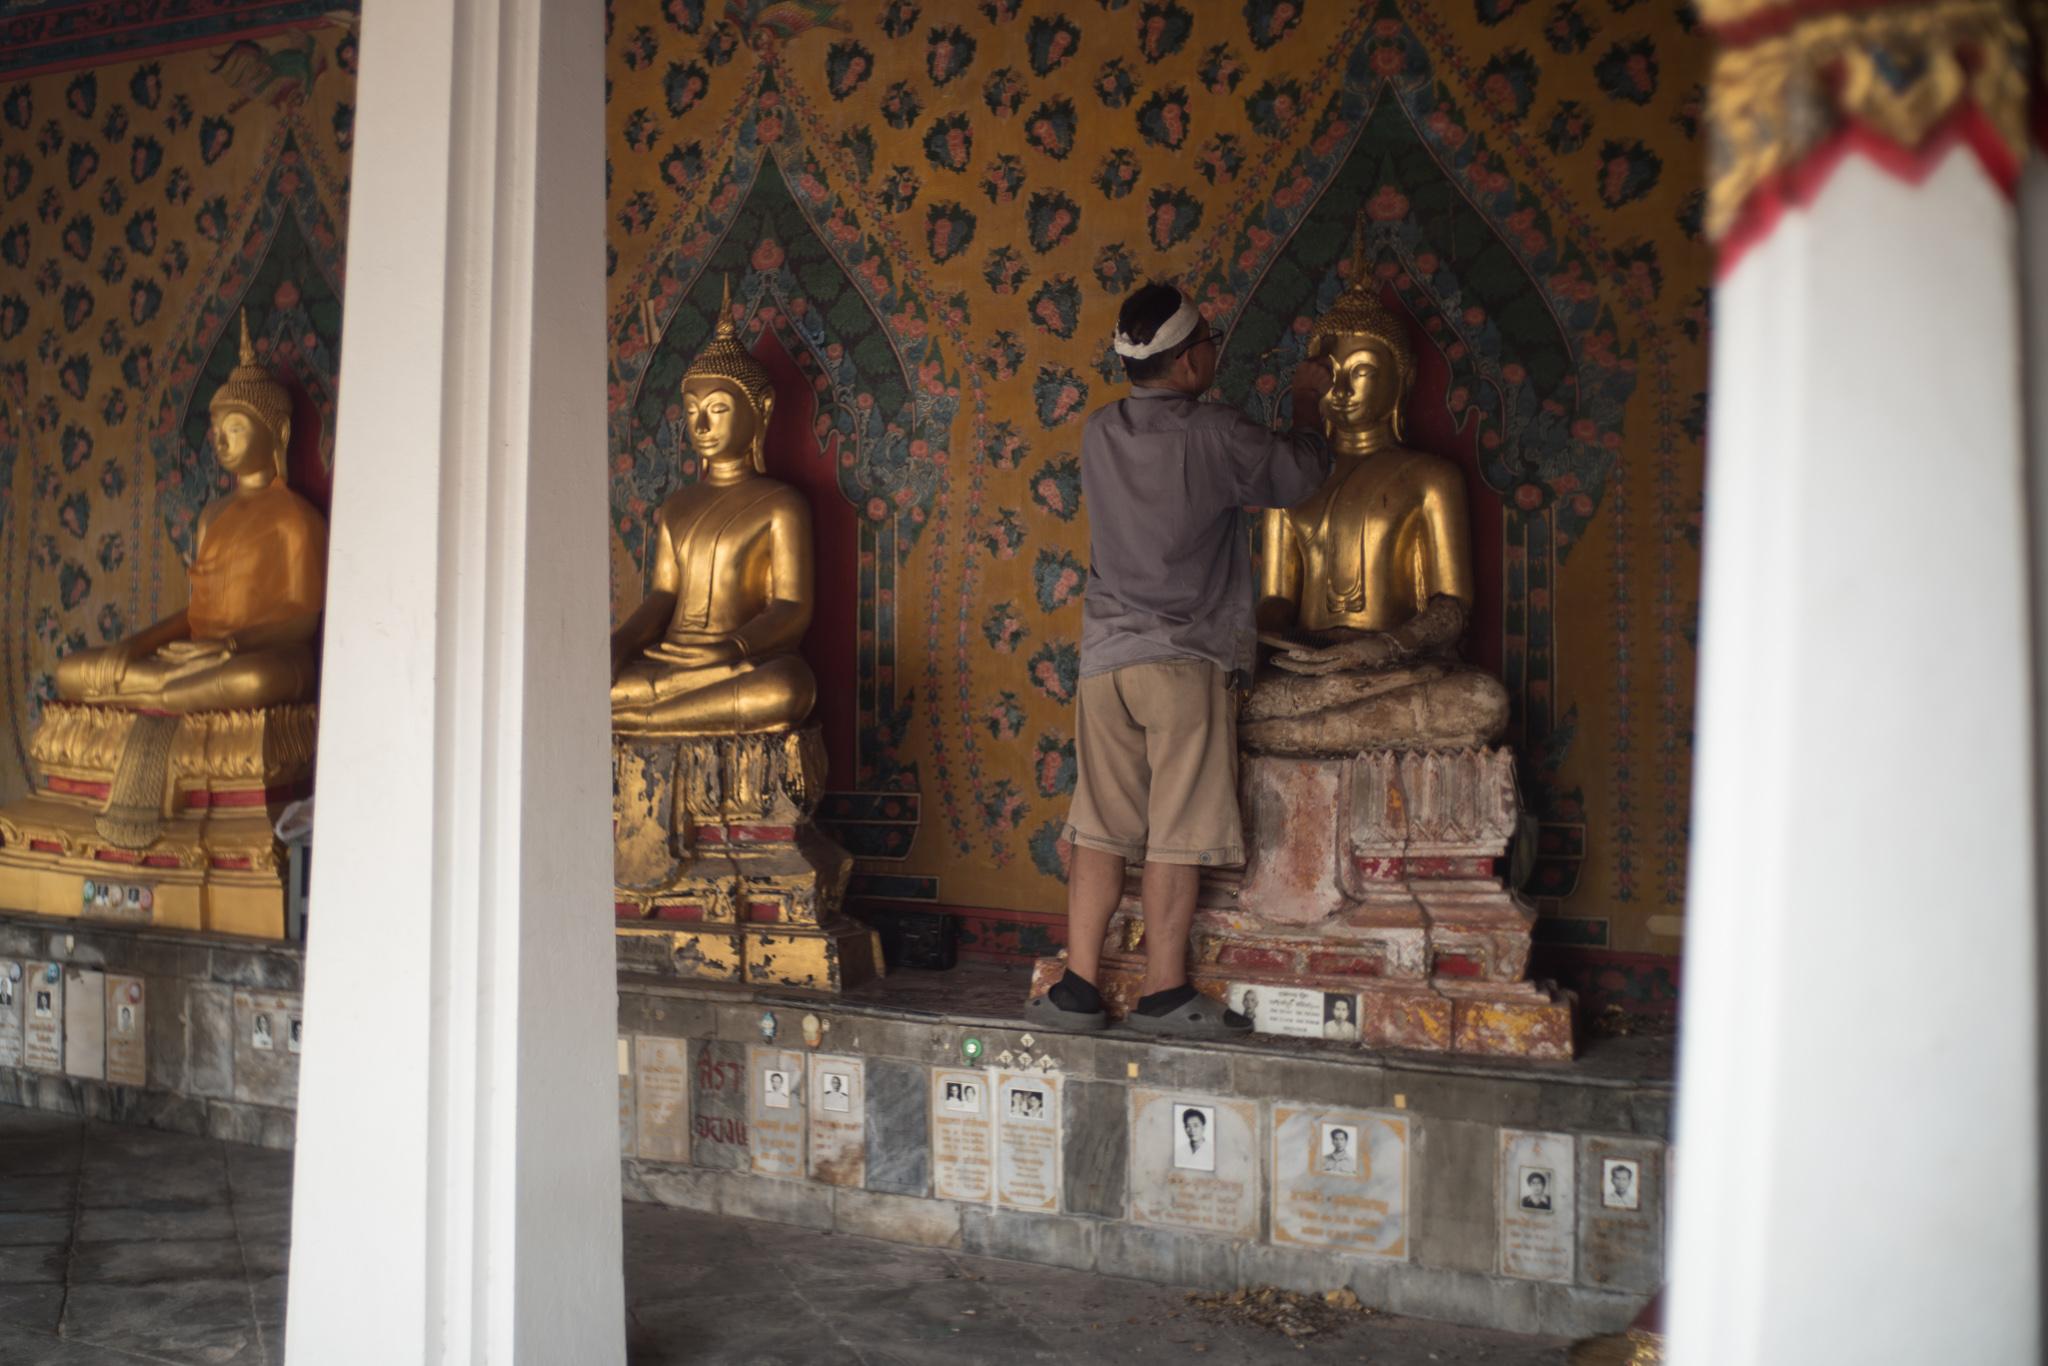 August 2016, Wat Arun Complex, Bangkok (กรุงเทพมหานคร), Kingdom of Thailand (ราชอาณาจักรไทย).